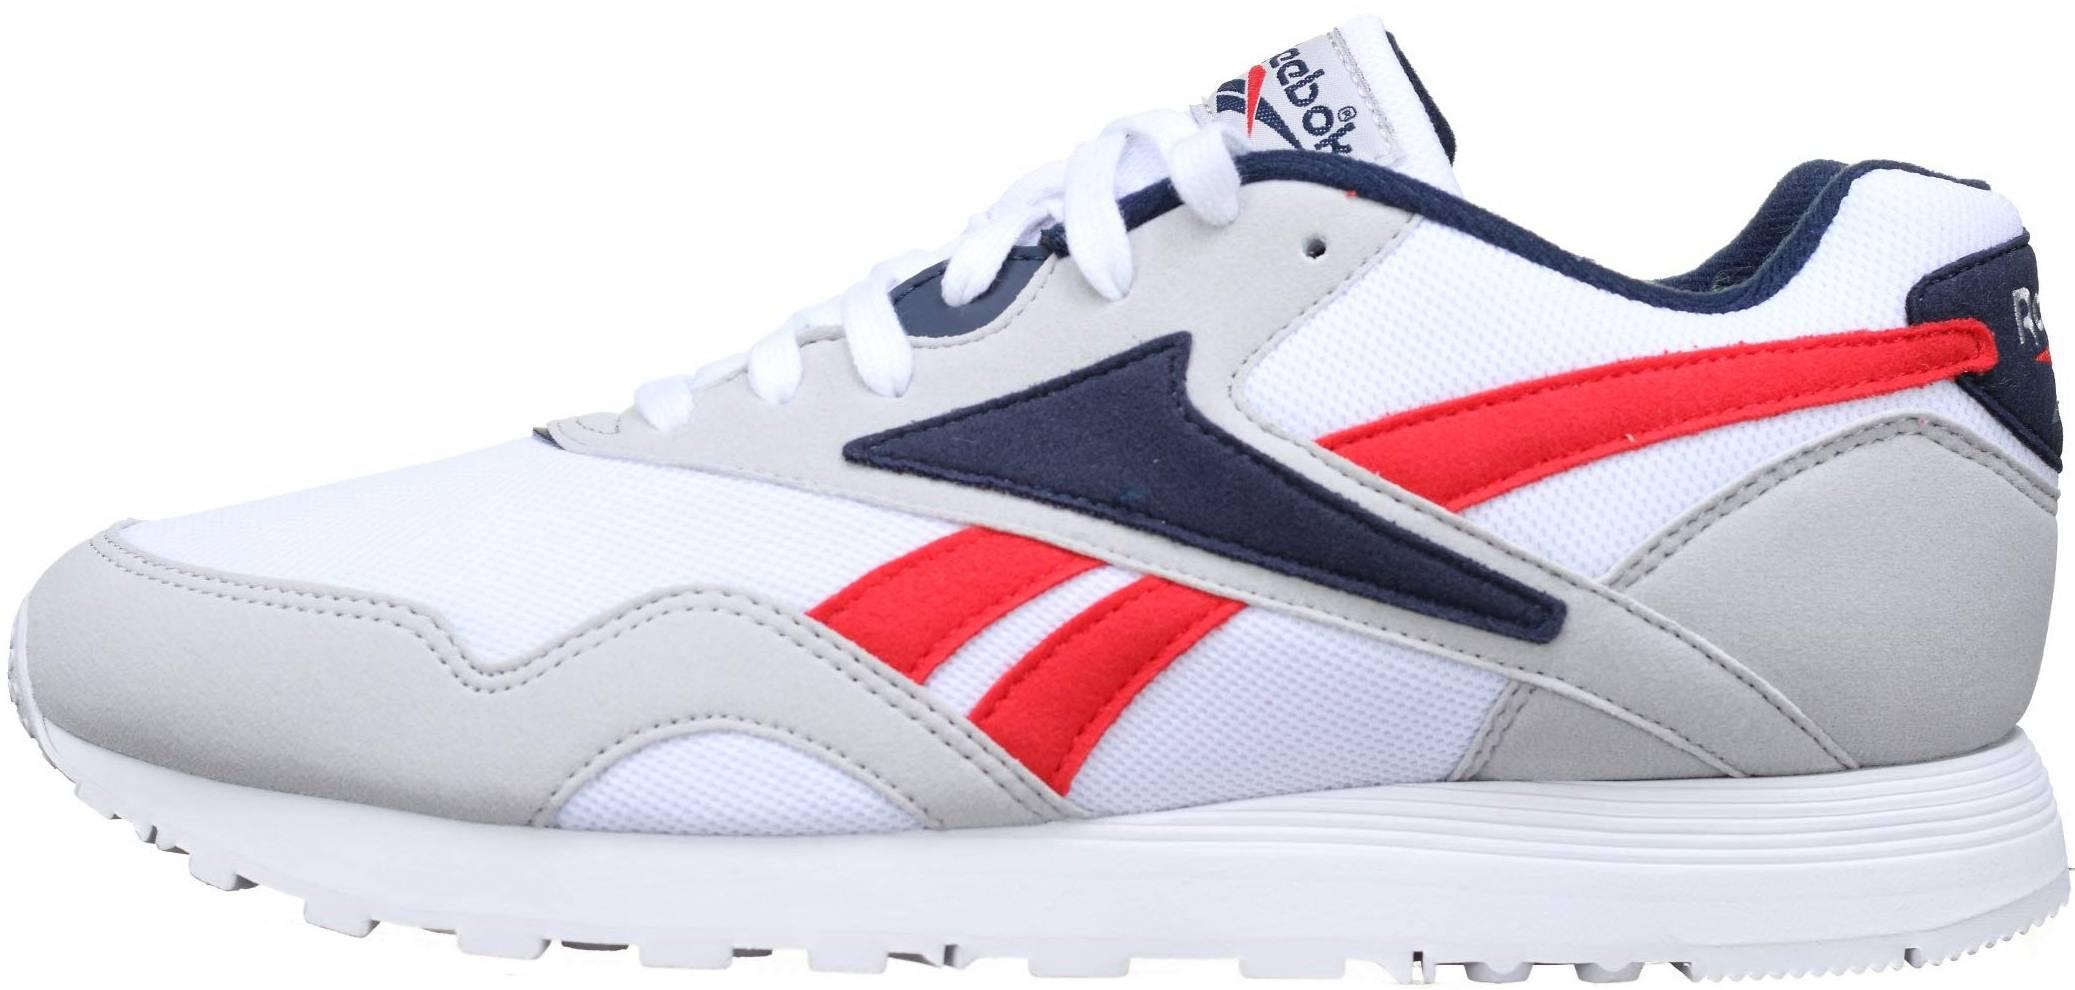 S t Horizontal Hazme  Reebok Rapide MU sneakers (only $72) | RunRepeat